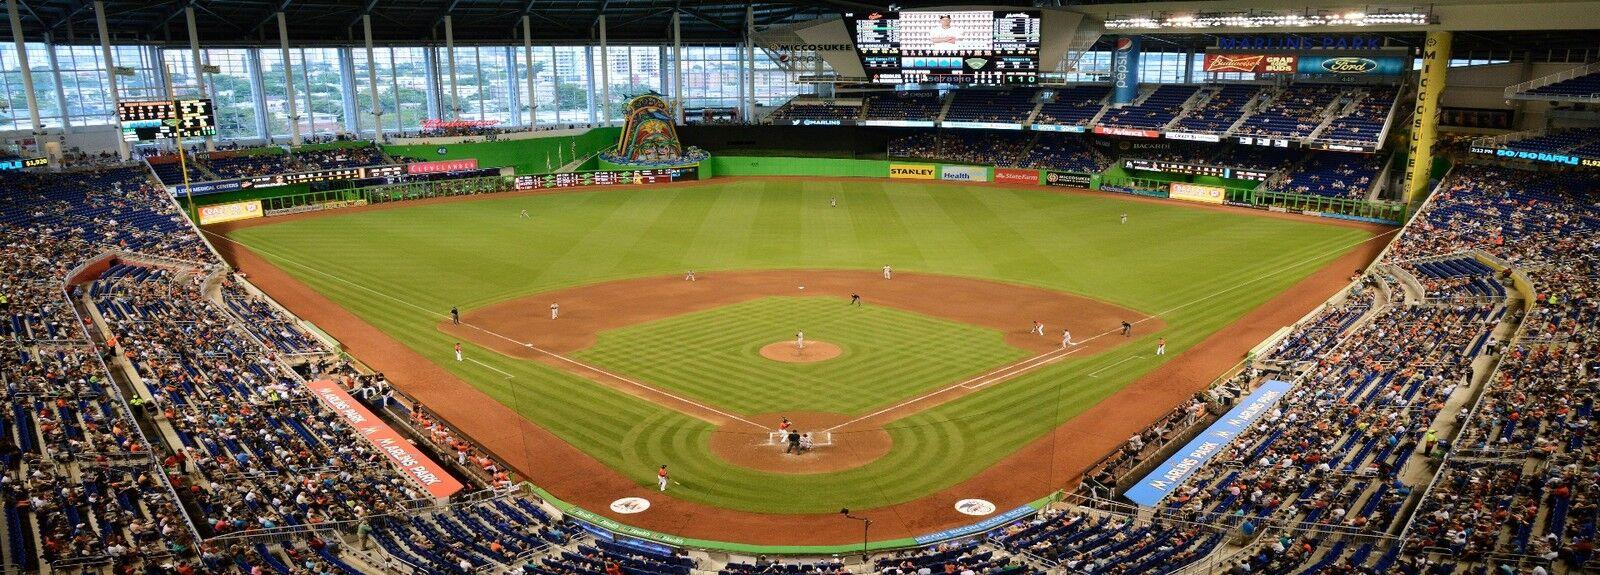 Houston Astros at Miami Marlins Spring Training Tickets (Split Squad)